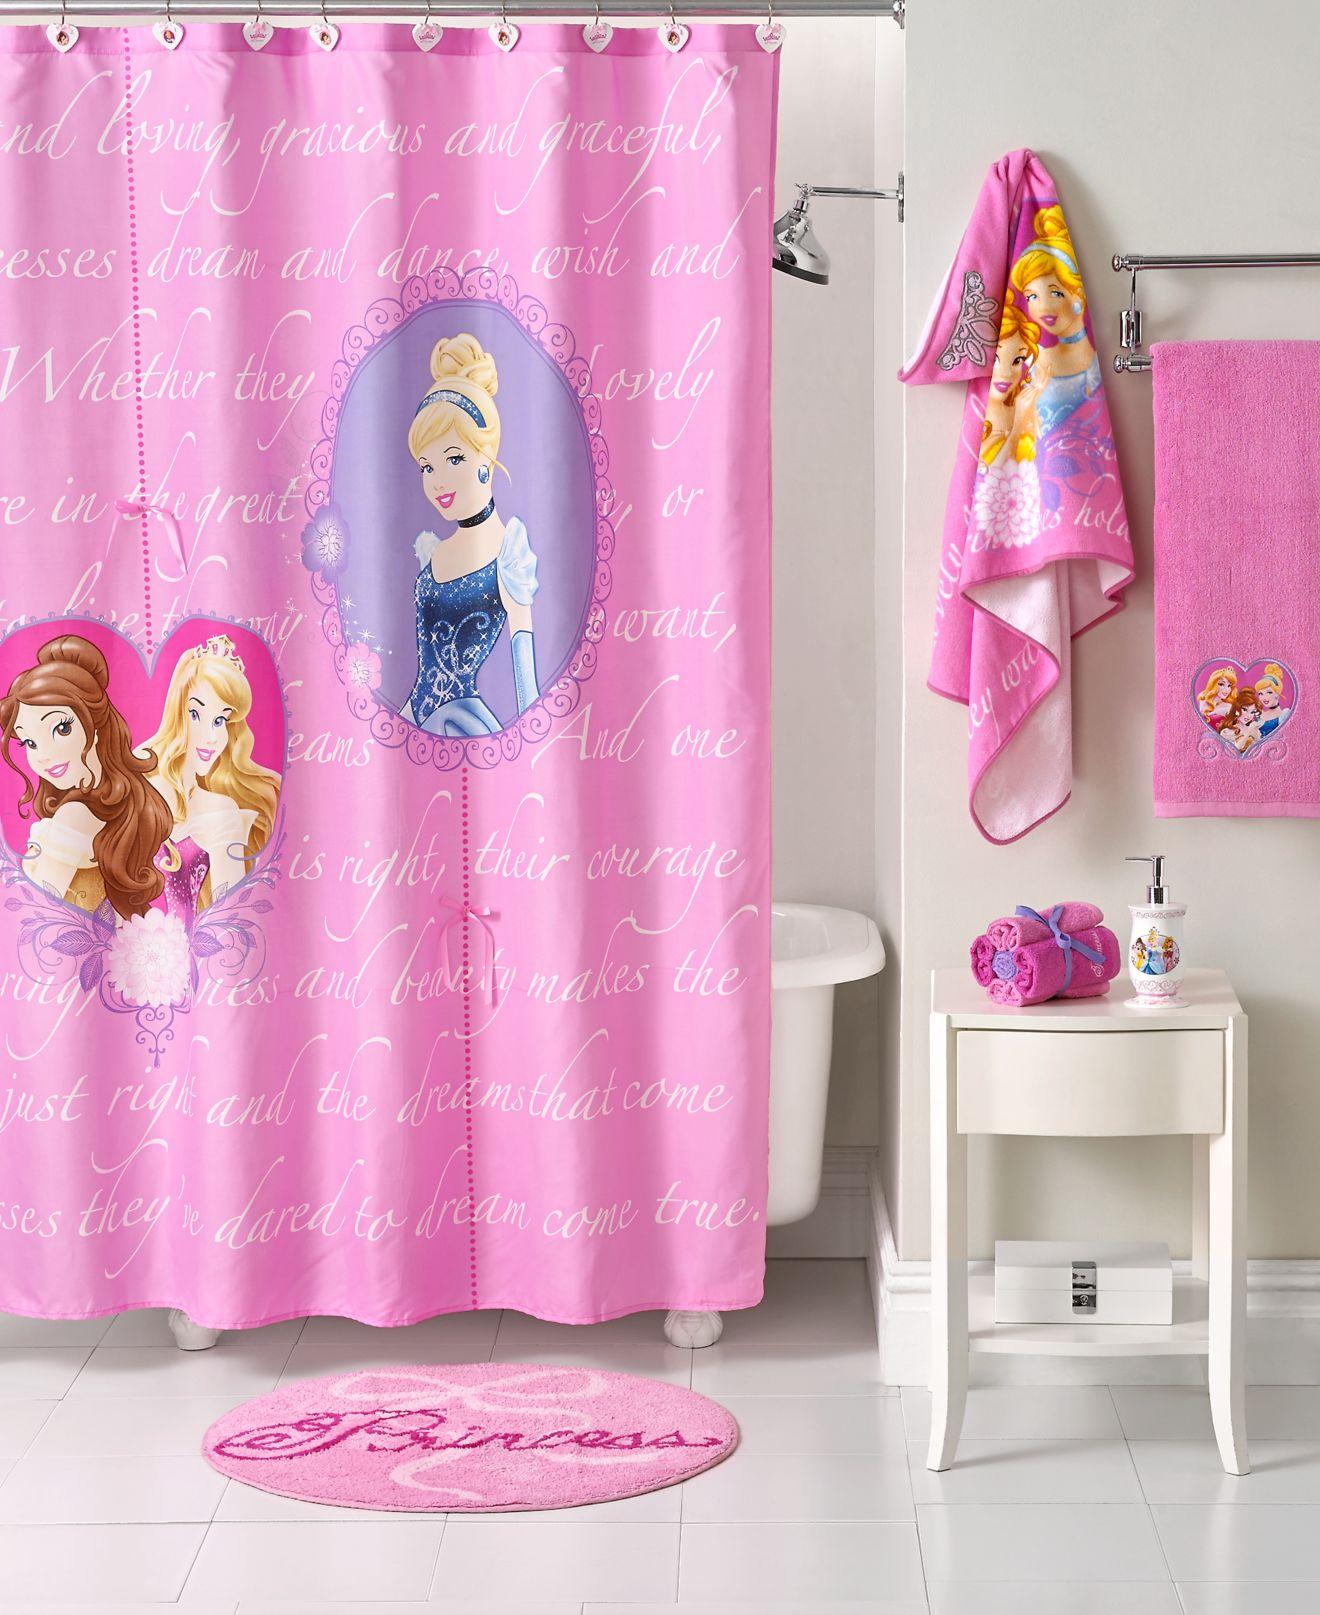 Disney Bathroom Decorating Ideas disney princess bathroom